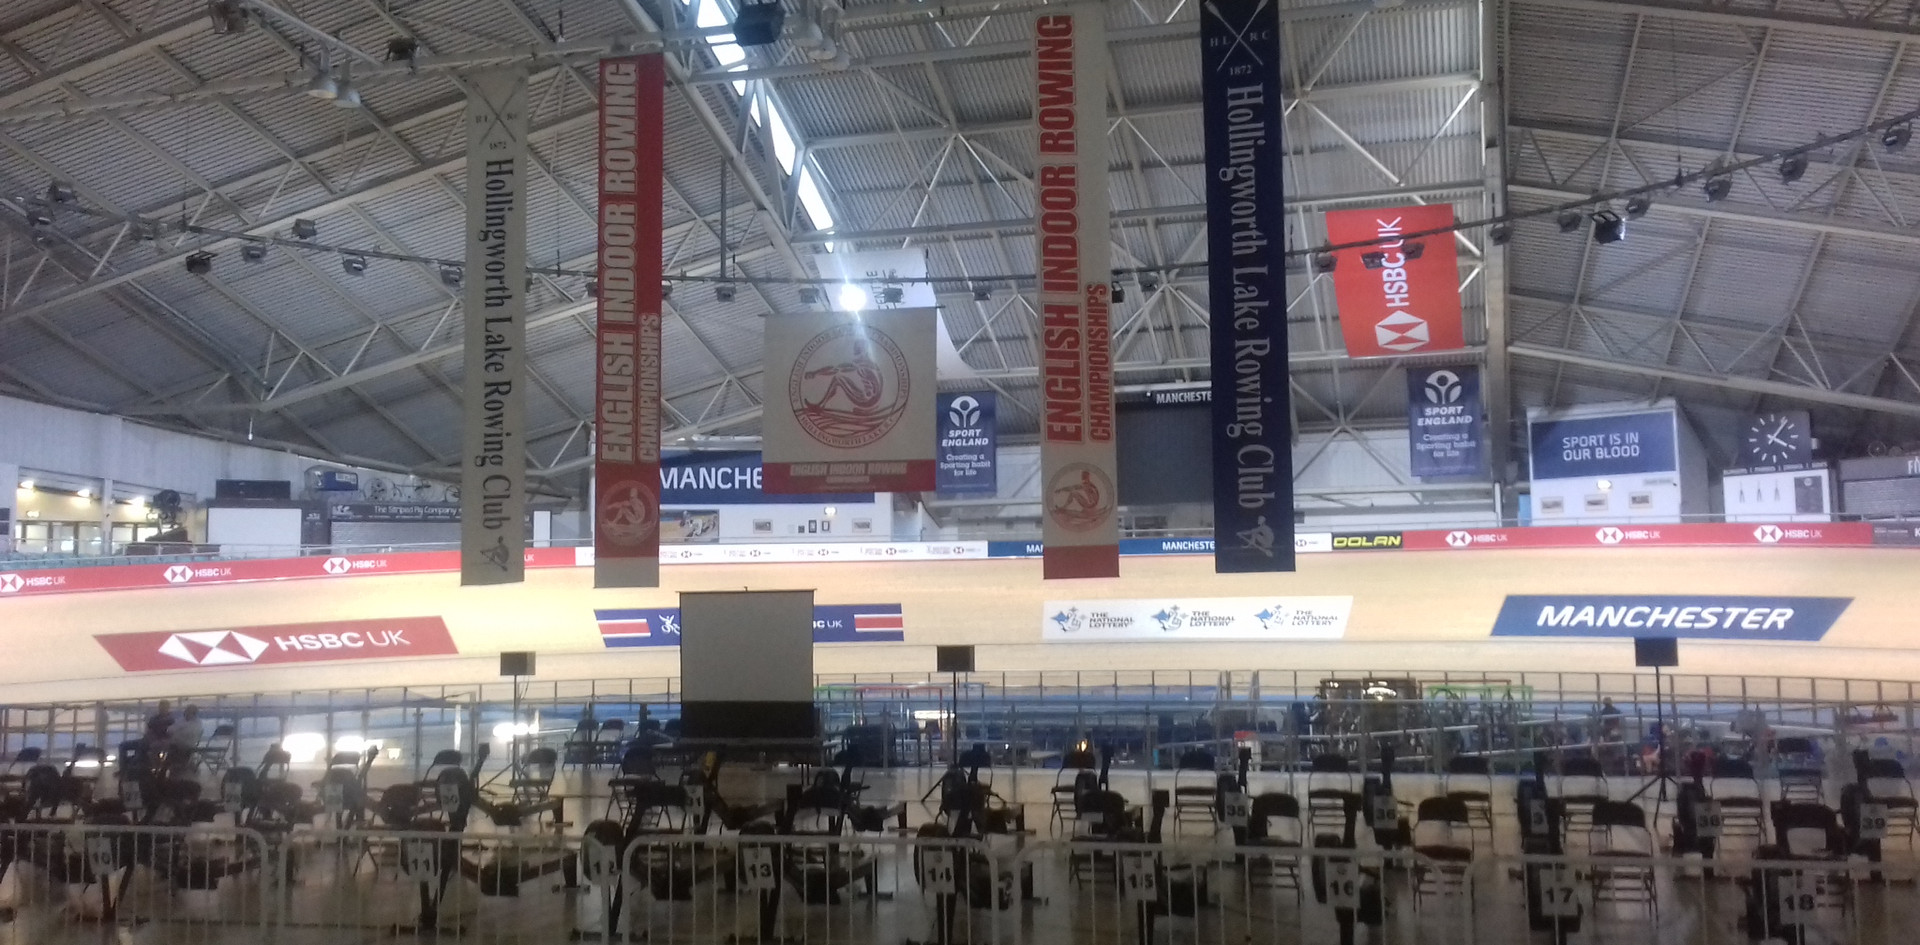 Manchester Velodrome setup